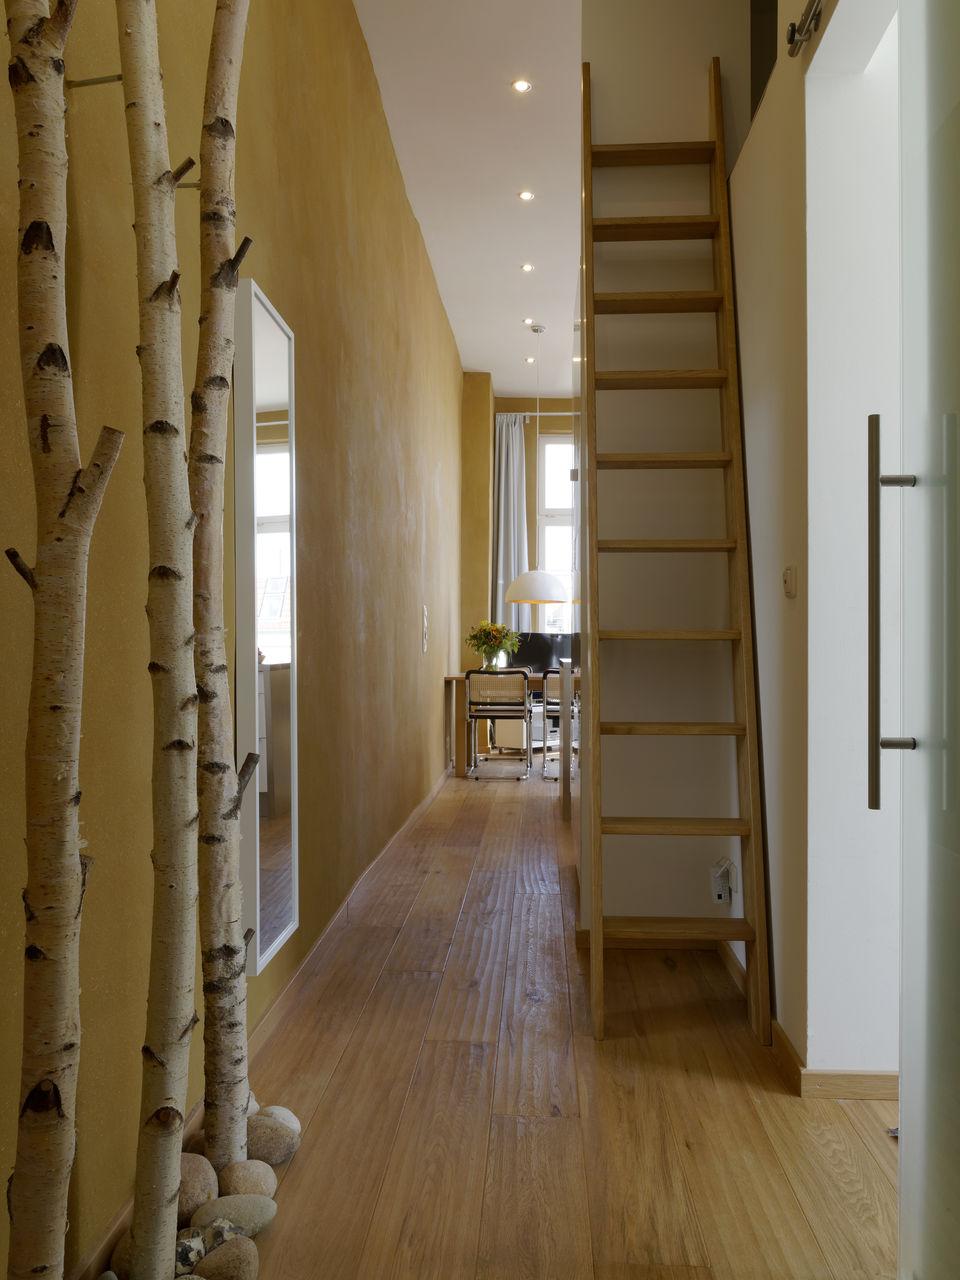 Moderne dachgeschoss wohnung in friedrichshain  farawayhome